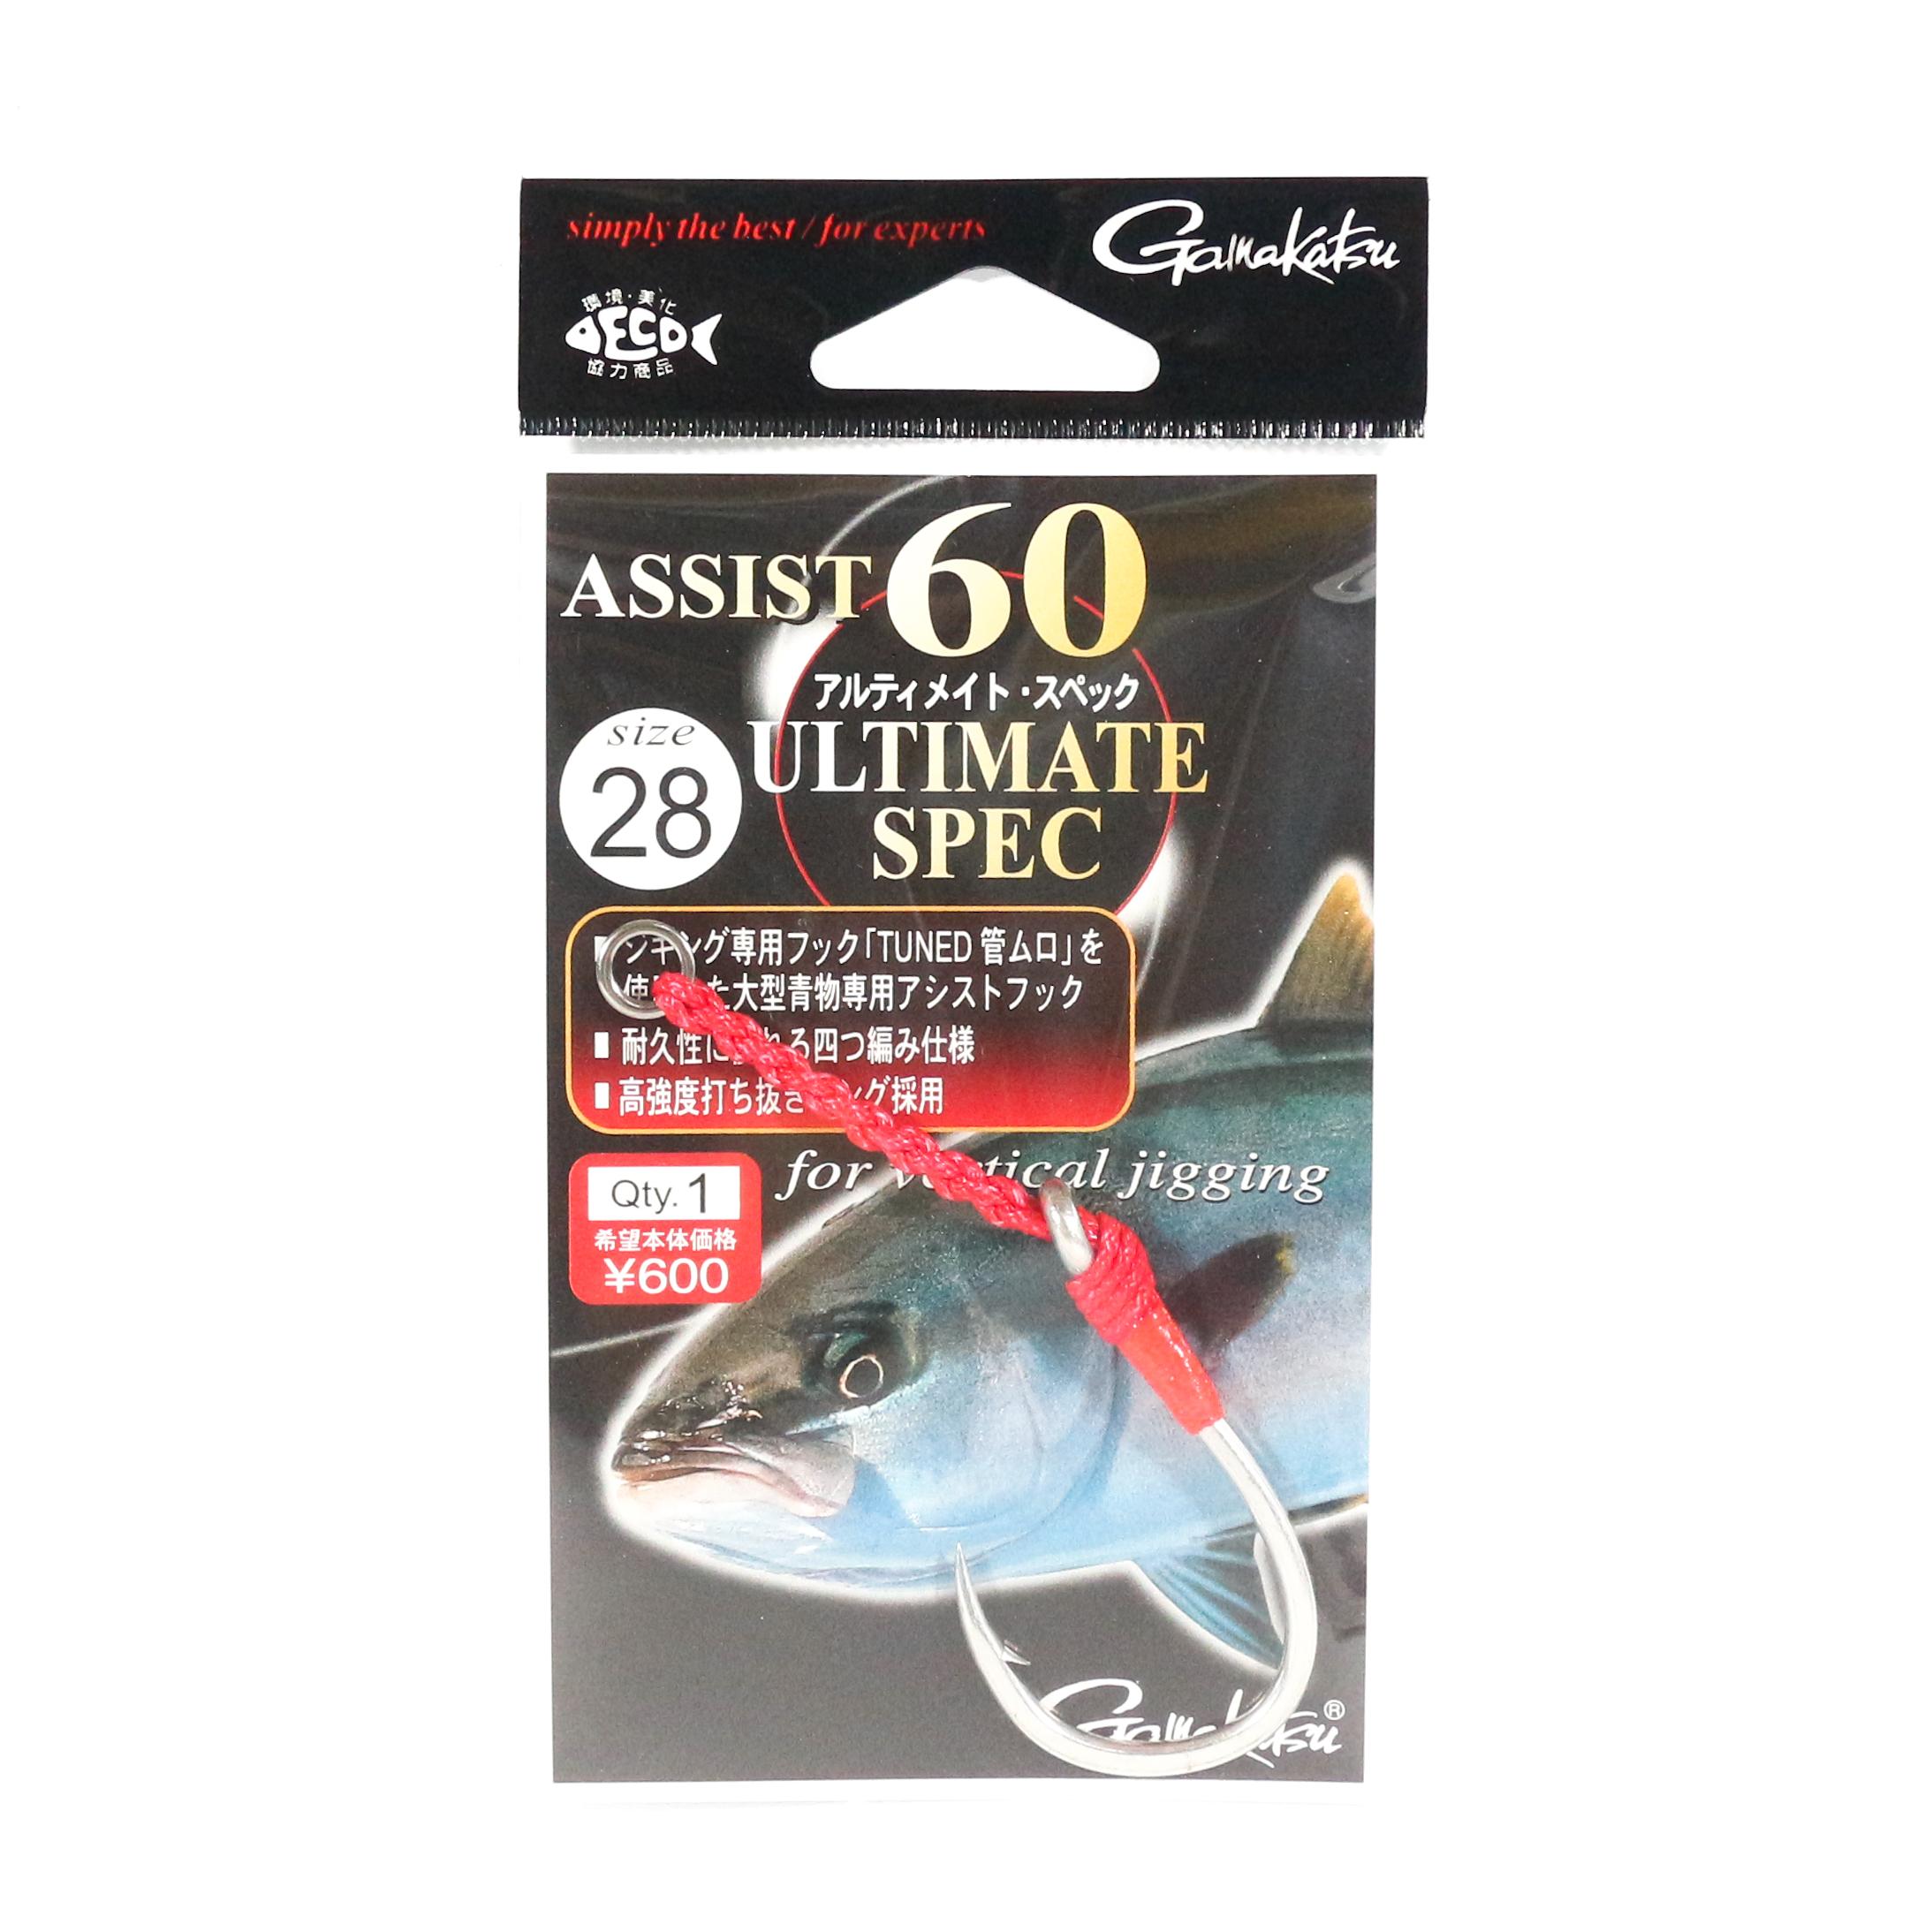 Sale Gamakatsu Assist 60 Ultimate Spec Assist Hook Size 28 (3746)